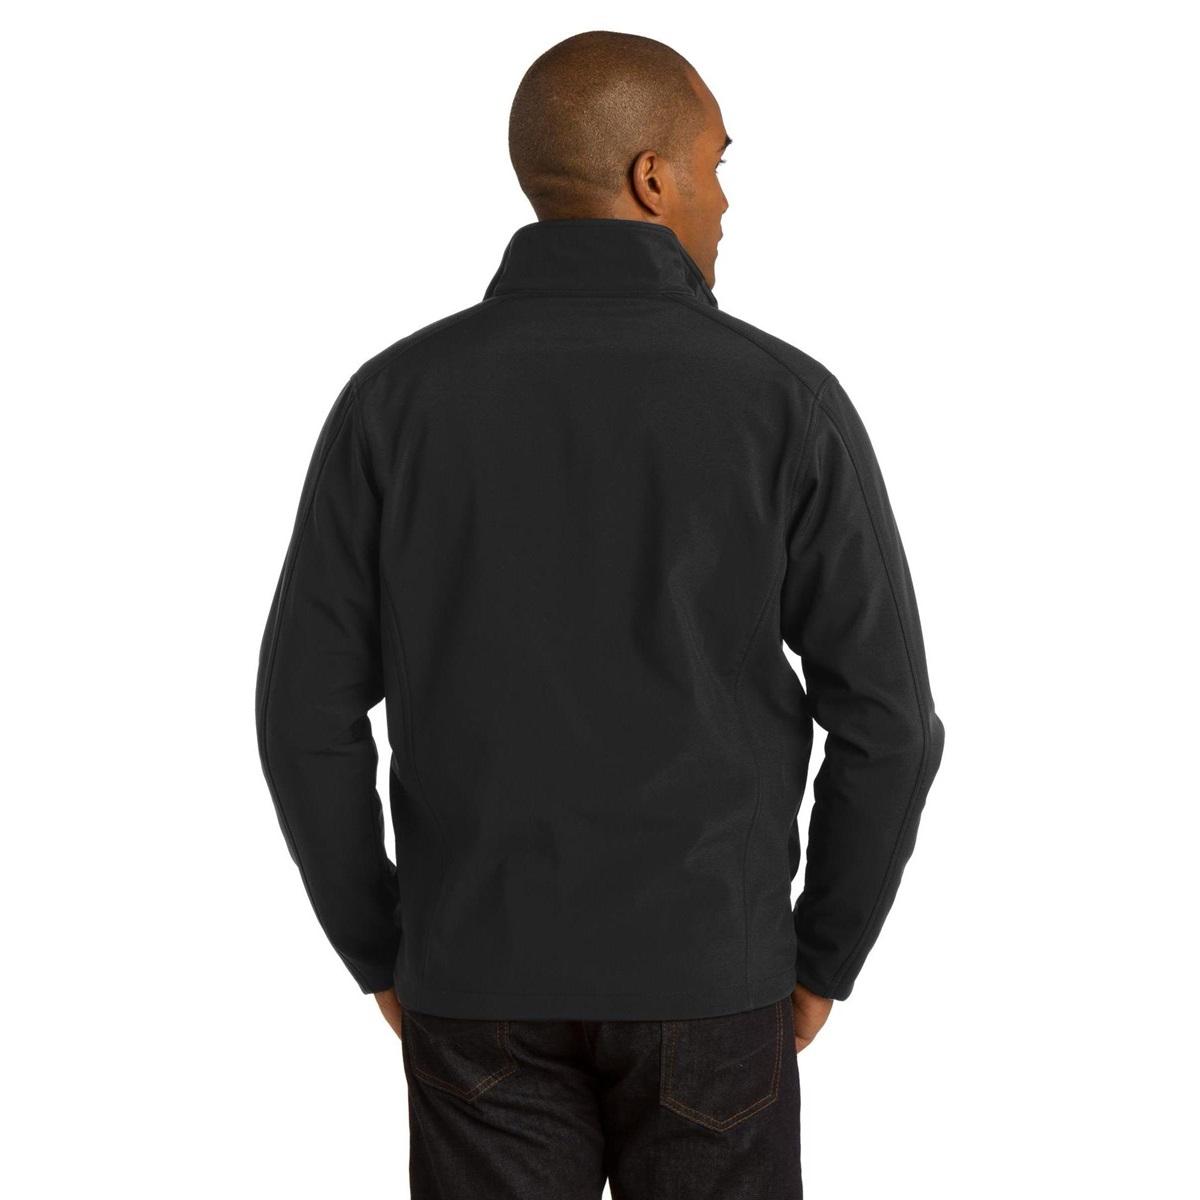 Port Authority J317 Core Soft Shell Jacket Black